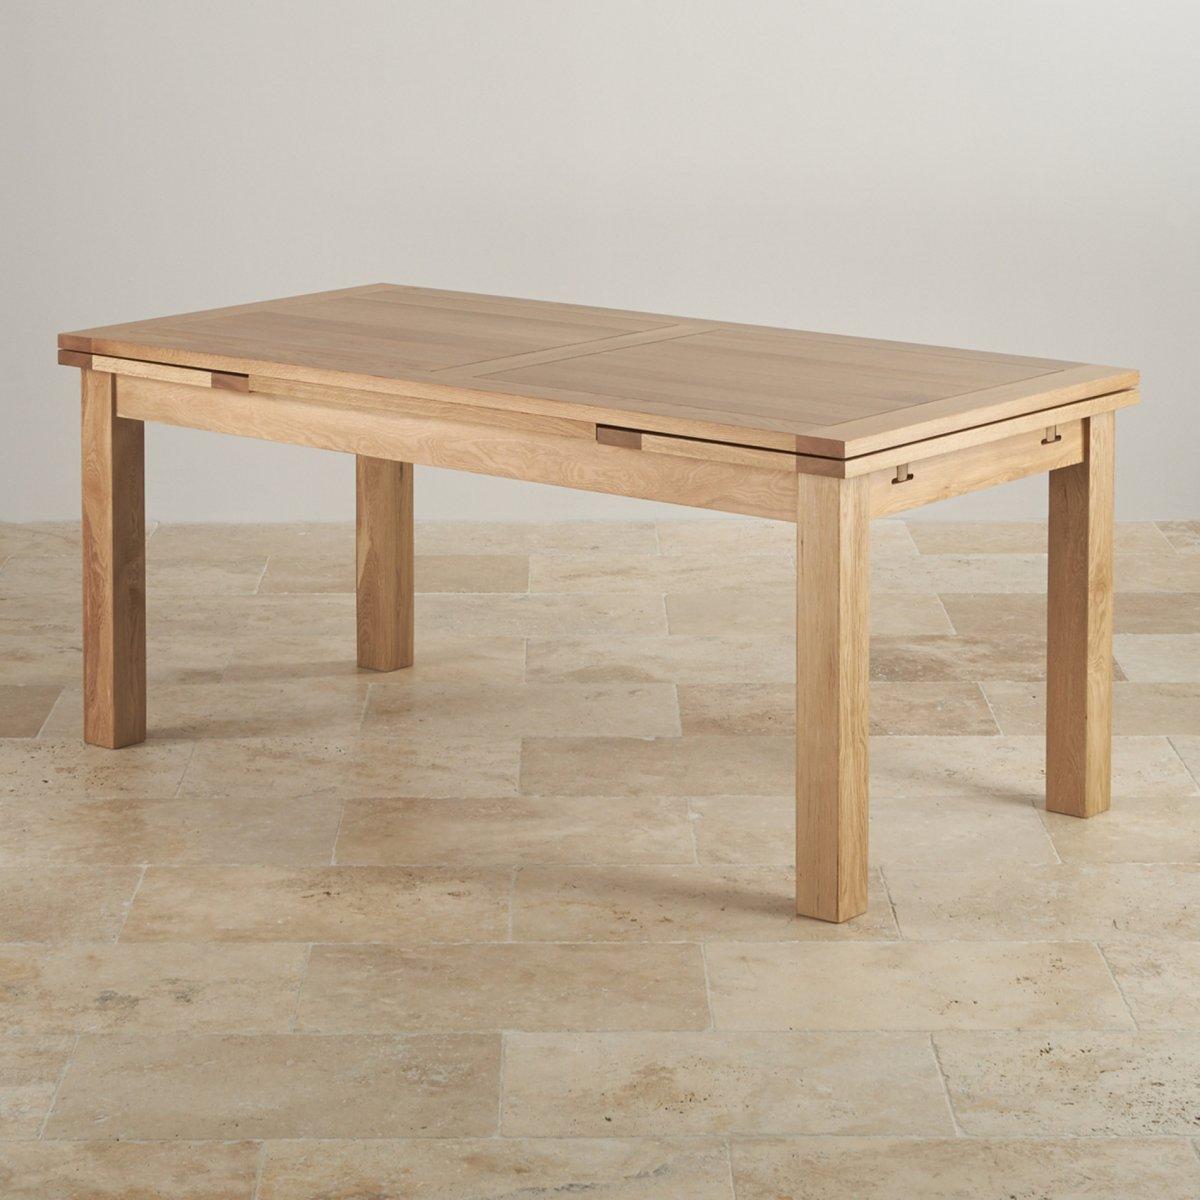 Dorset Extending Dining Table In Natural Oak